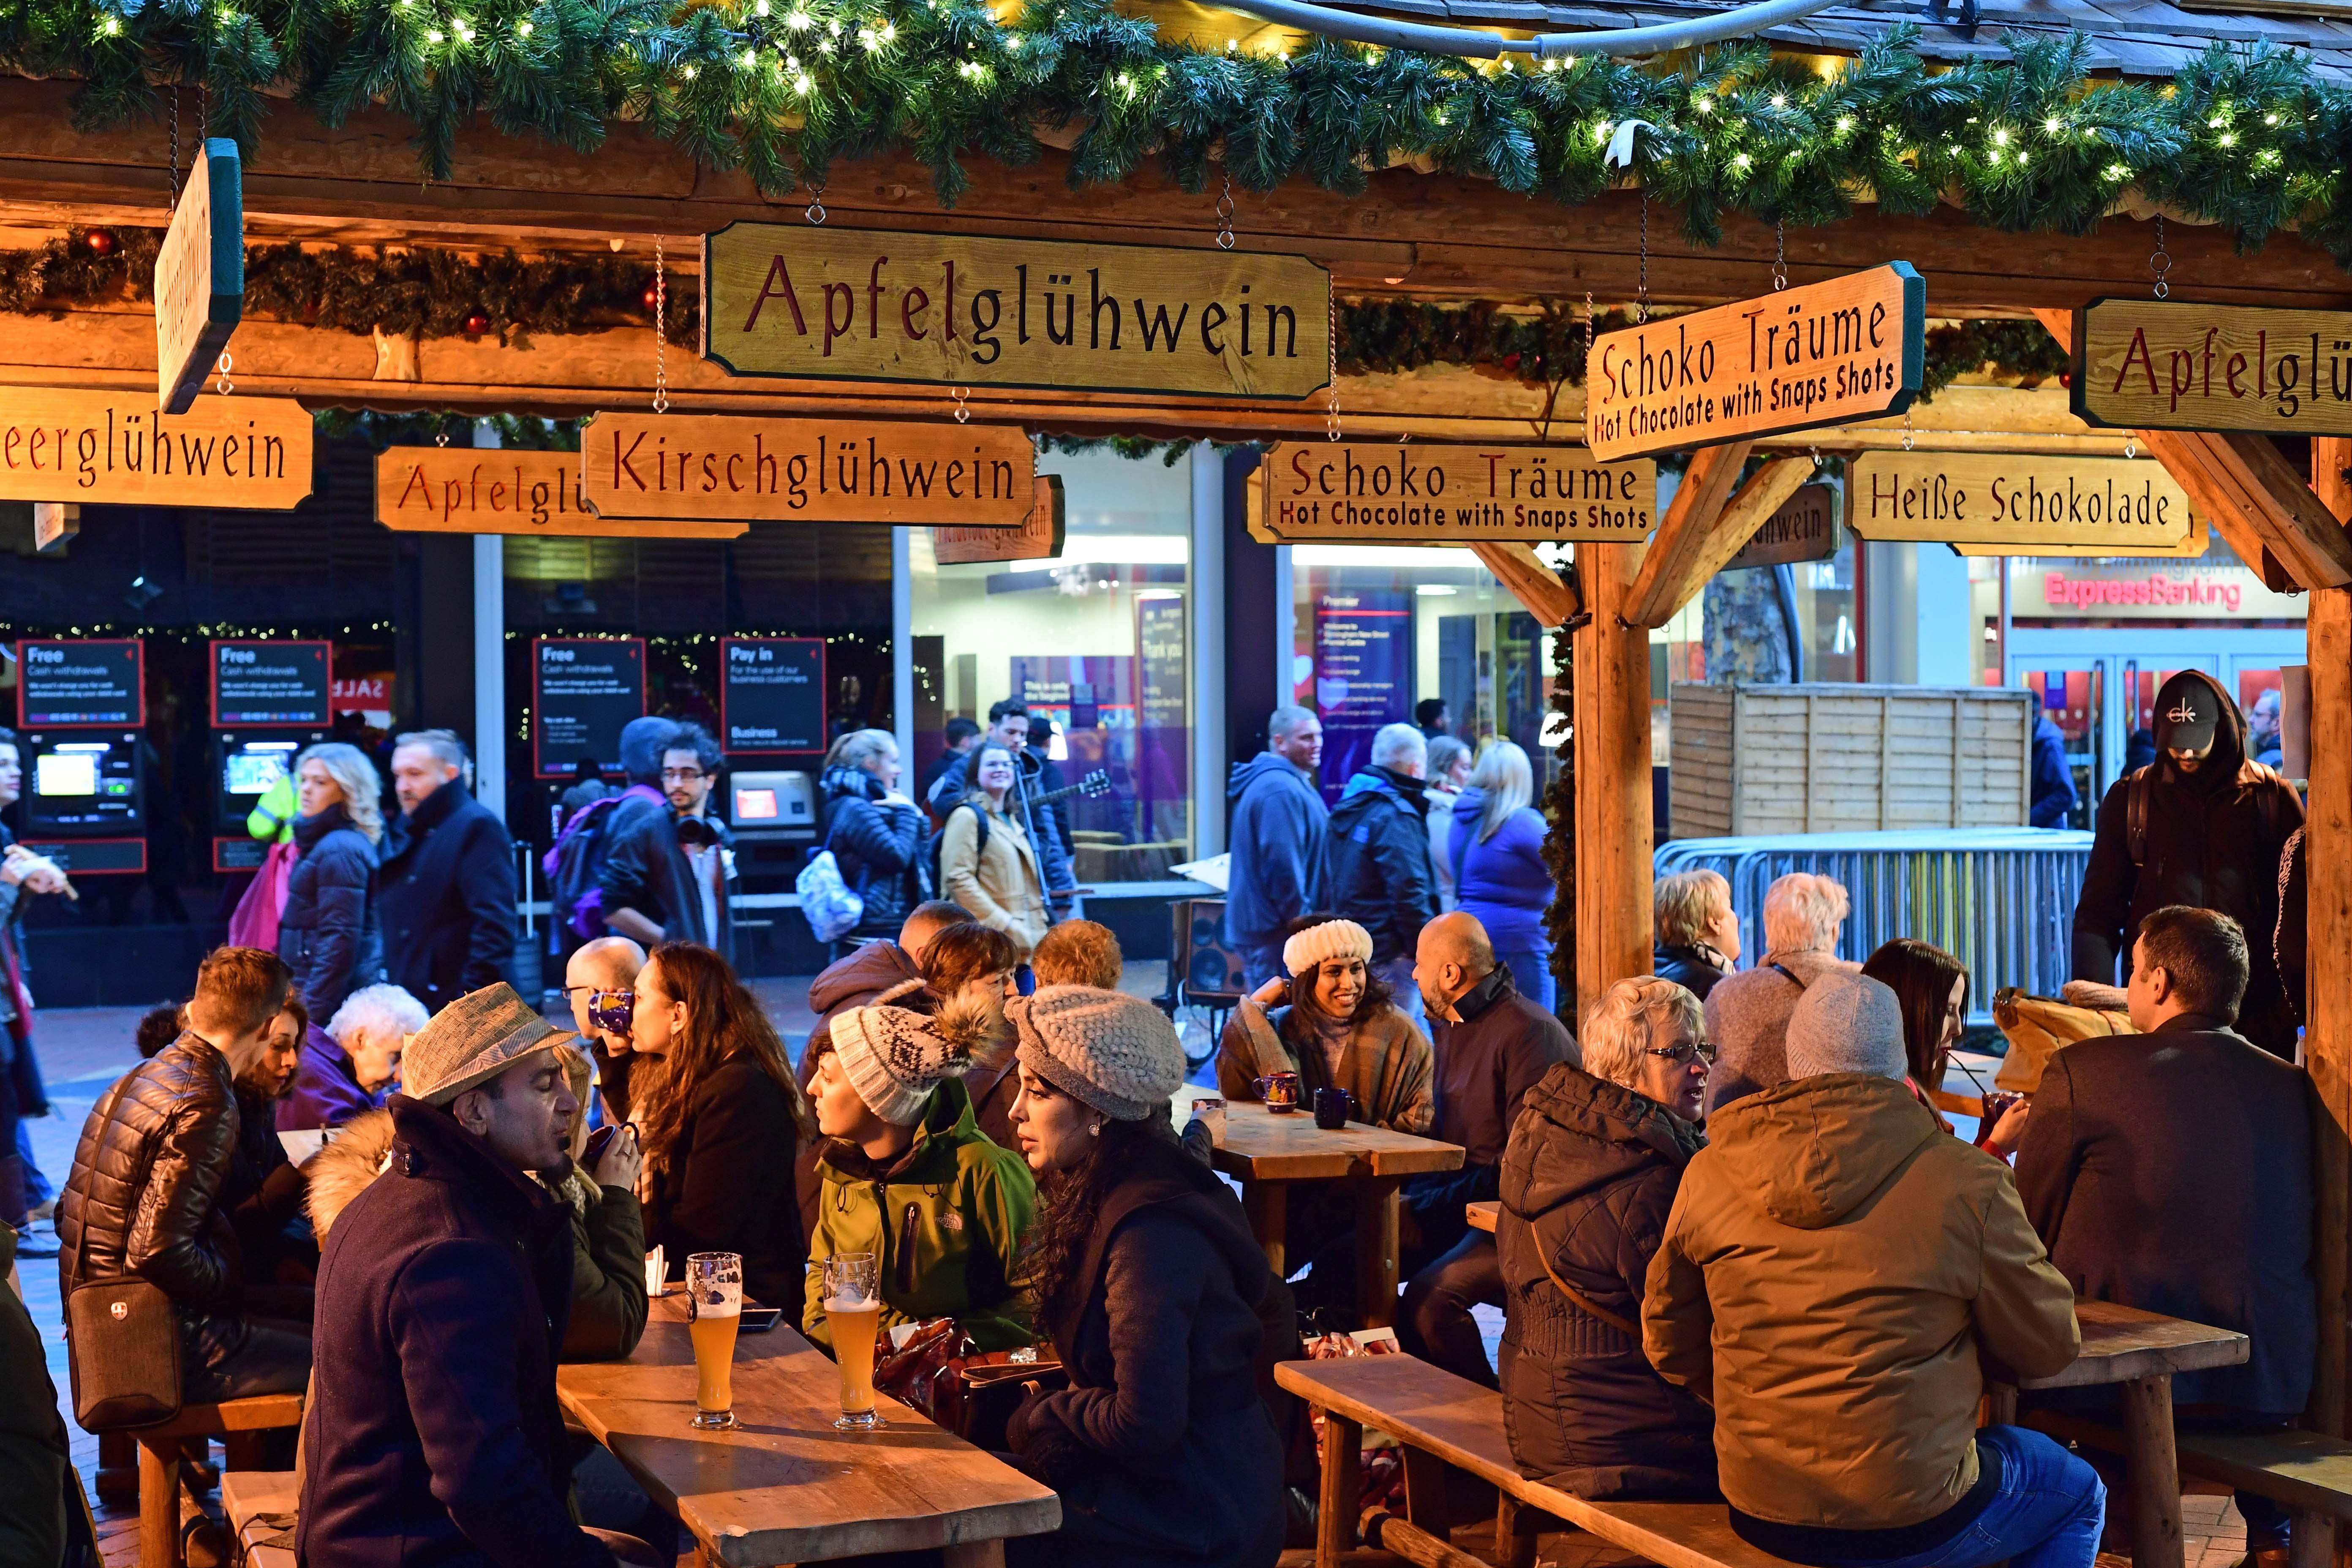 DG314173. Christmas Market. Bimingham. 30.11.18crop